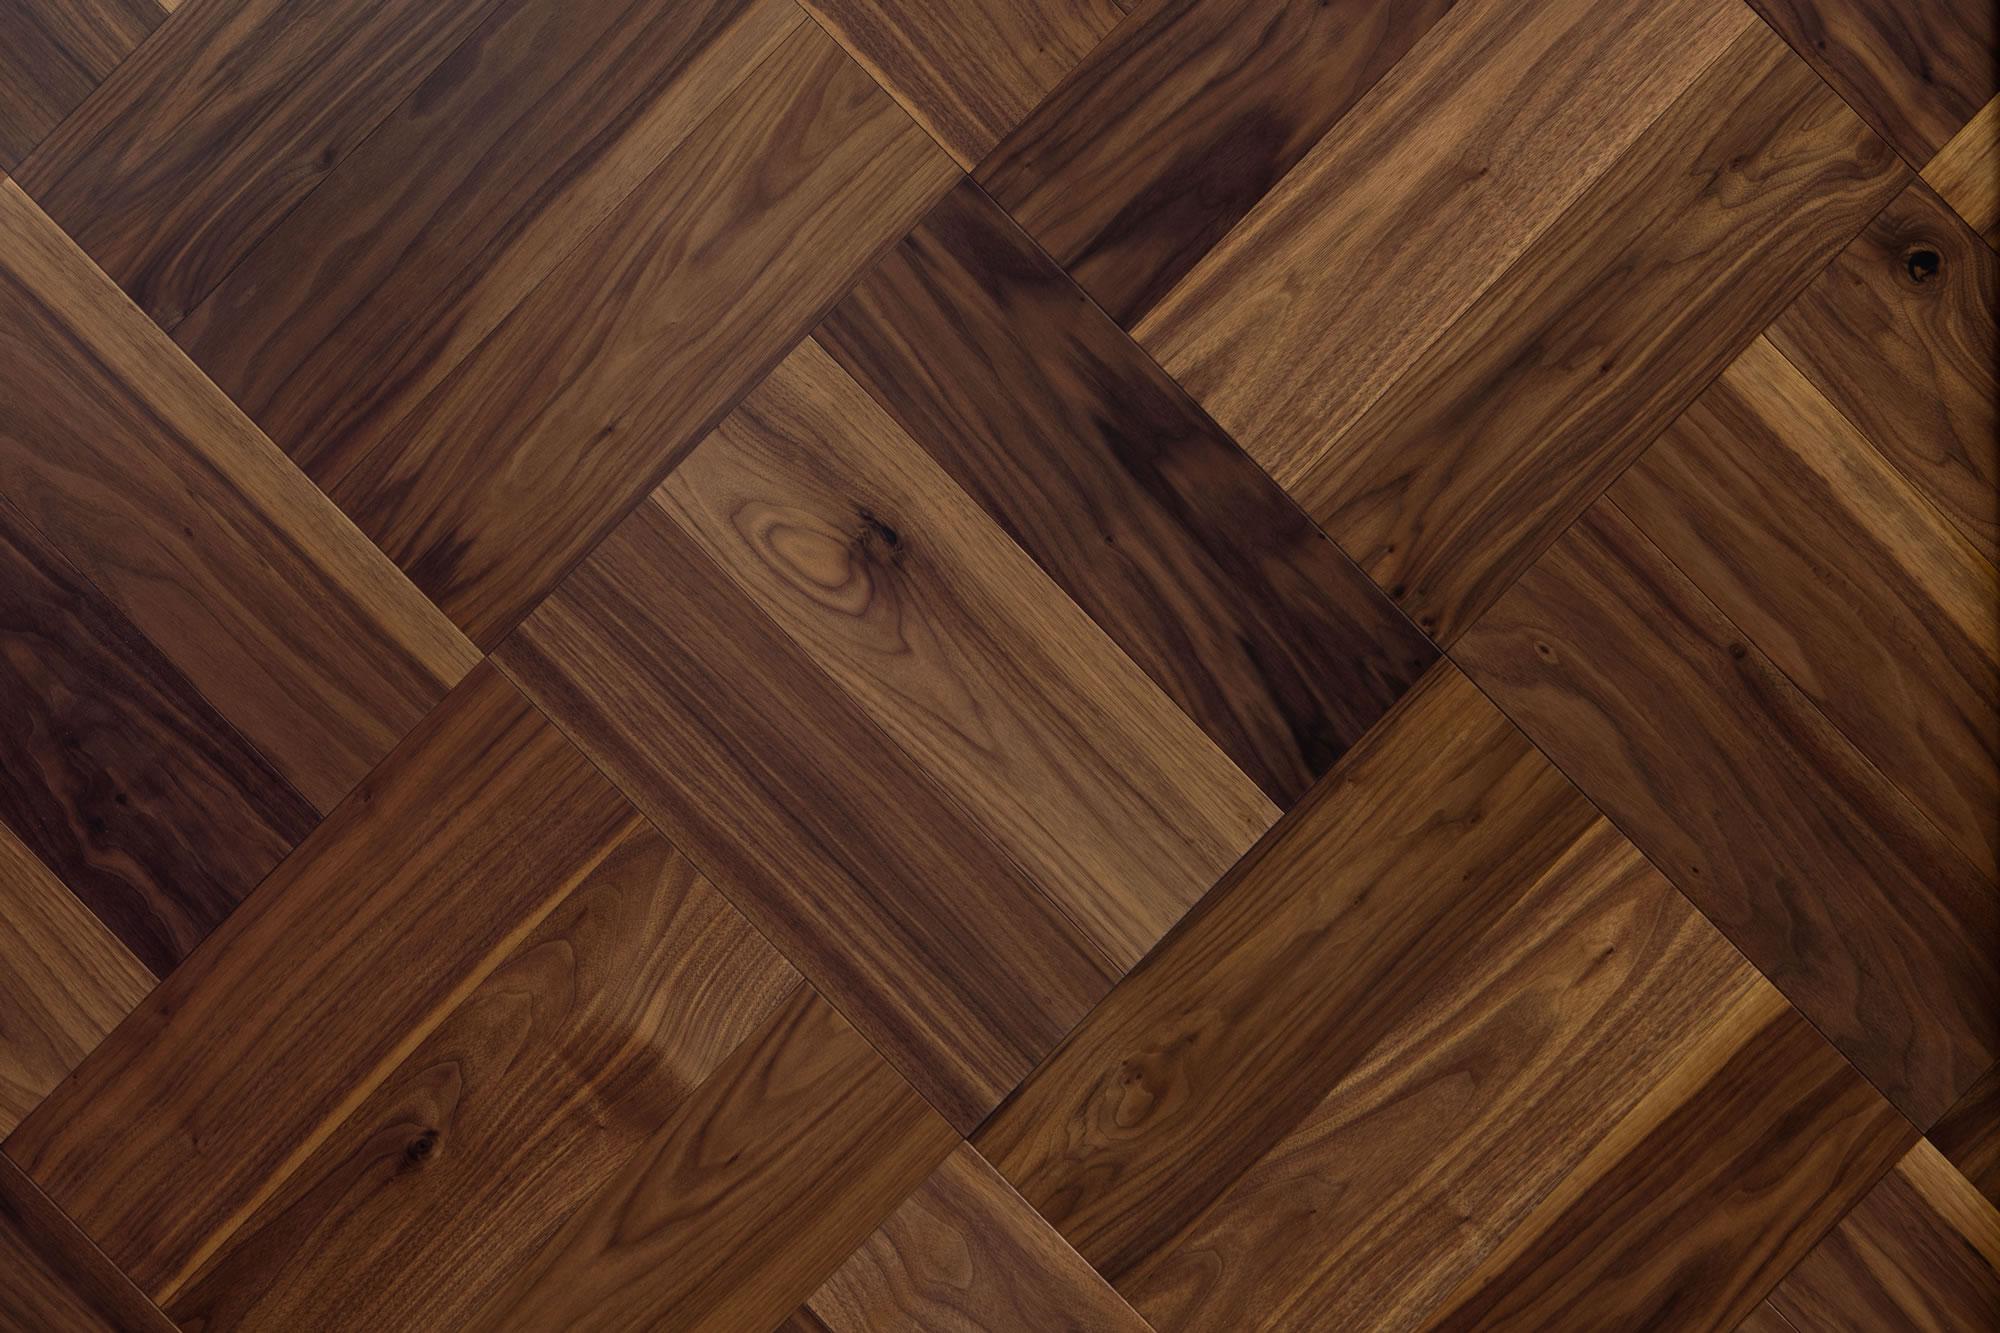 Wood Flooring Samples Cozy Home Design